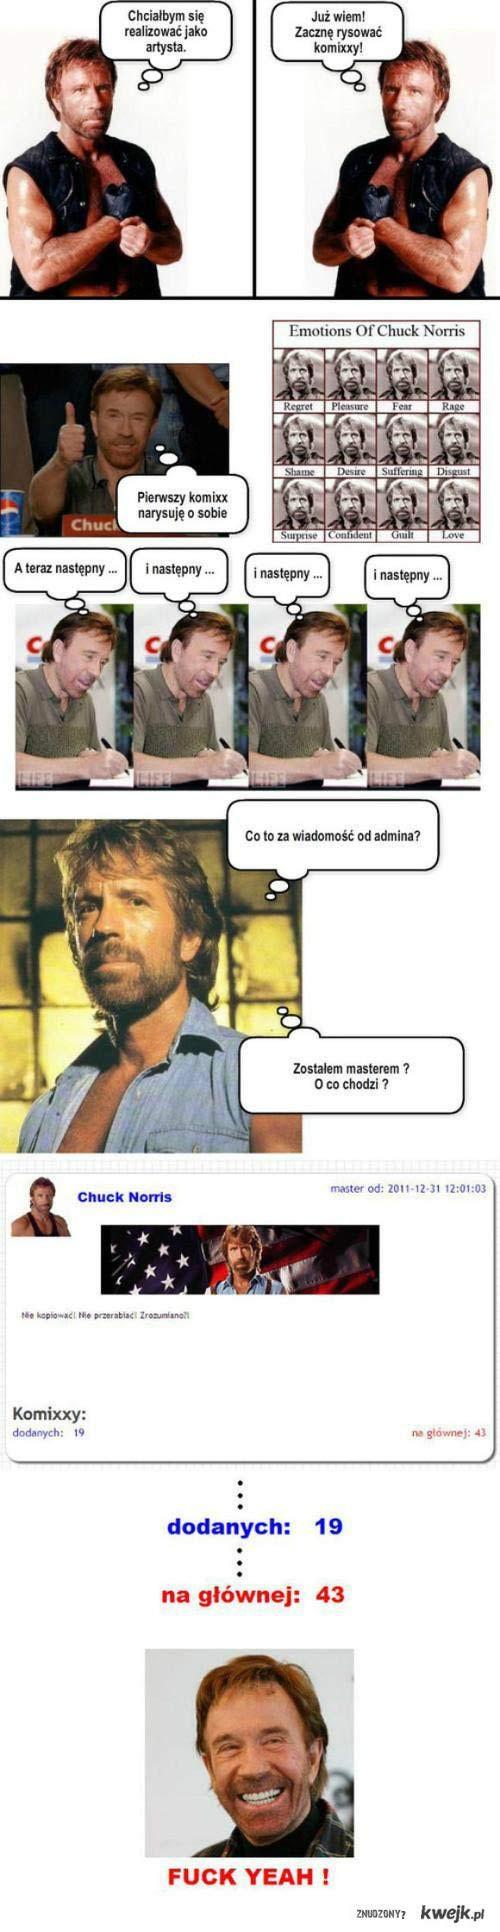 Chuck Norris rysuje komiksy